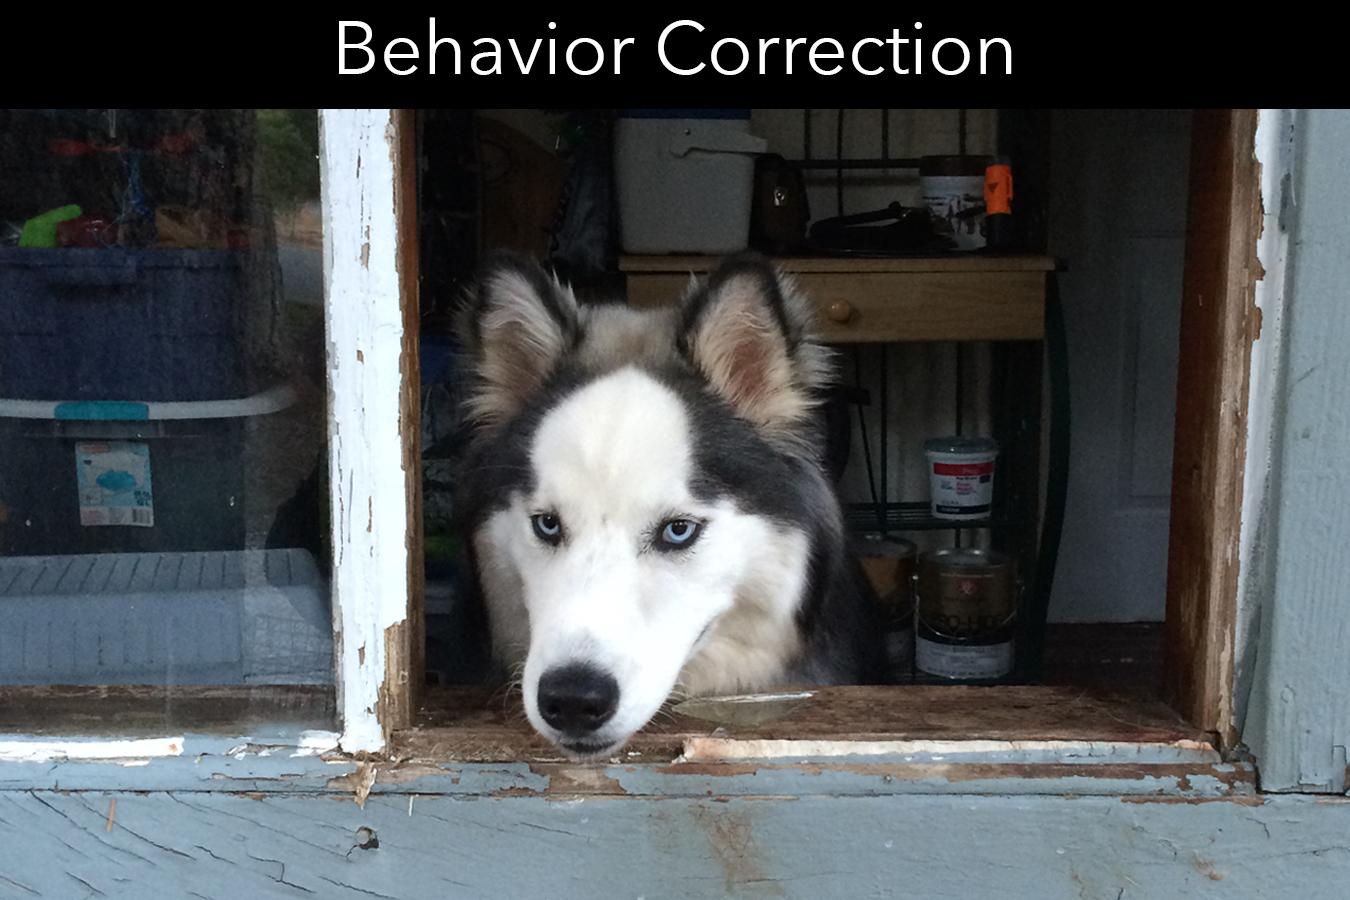 Behavior Correction